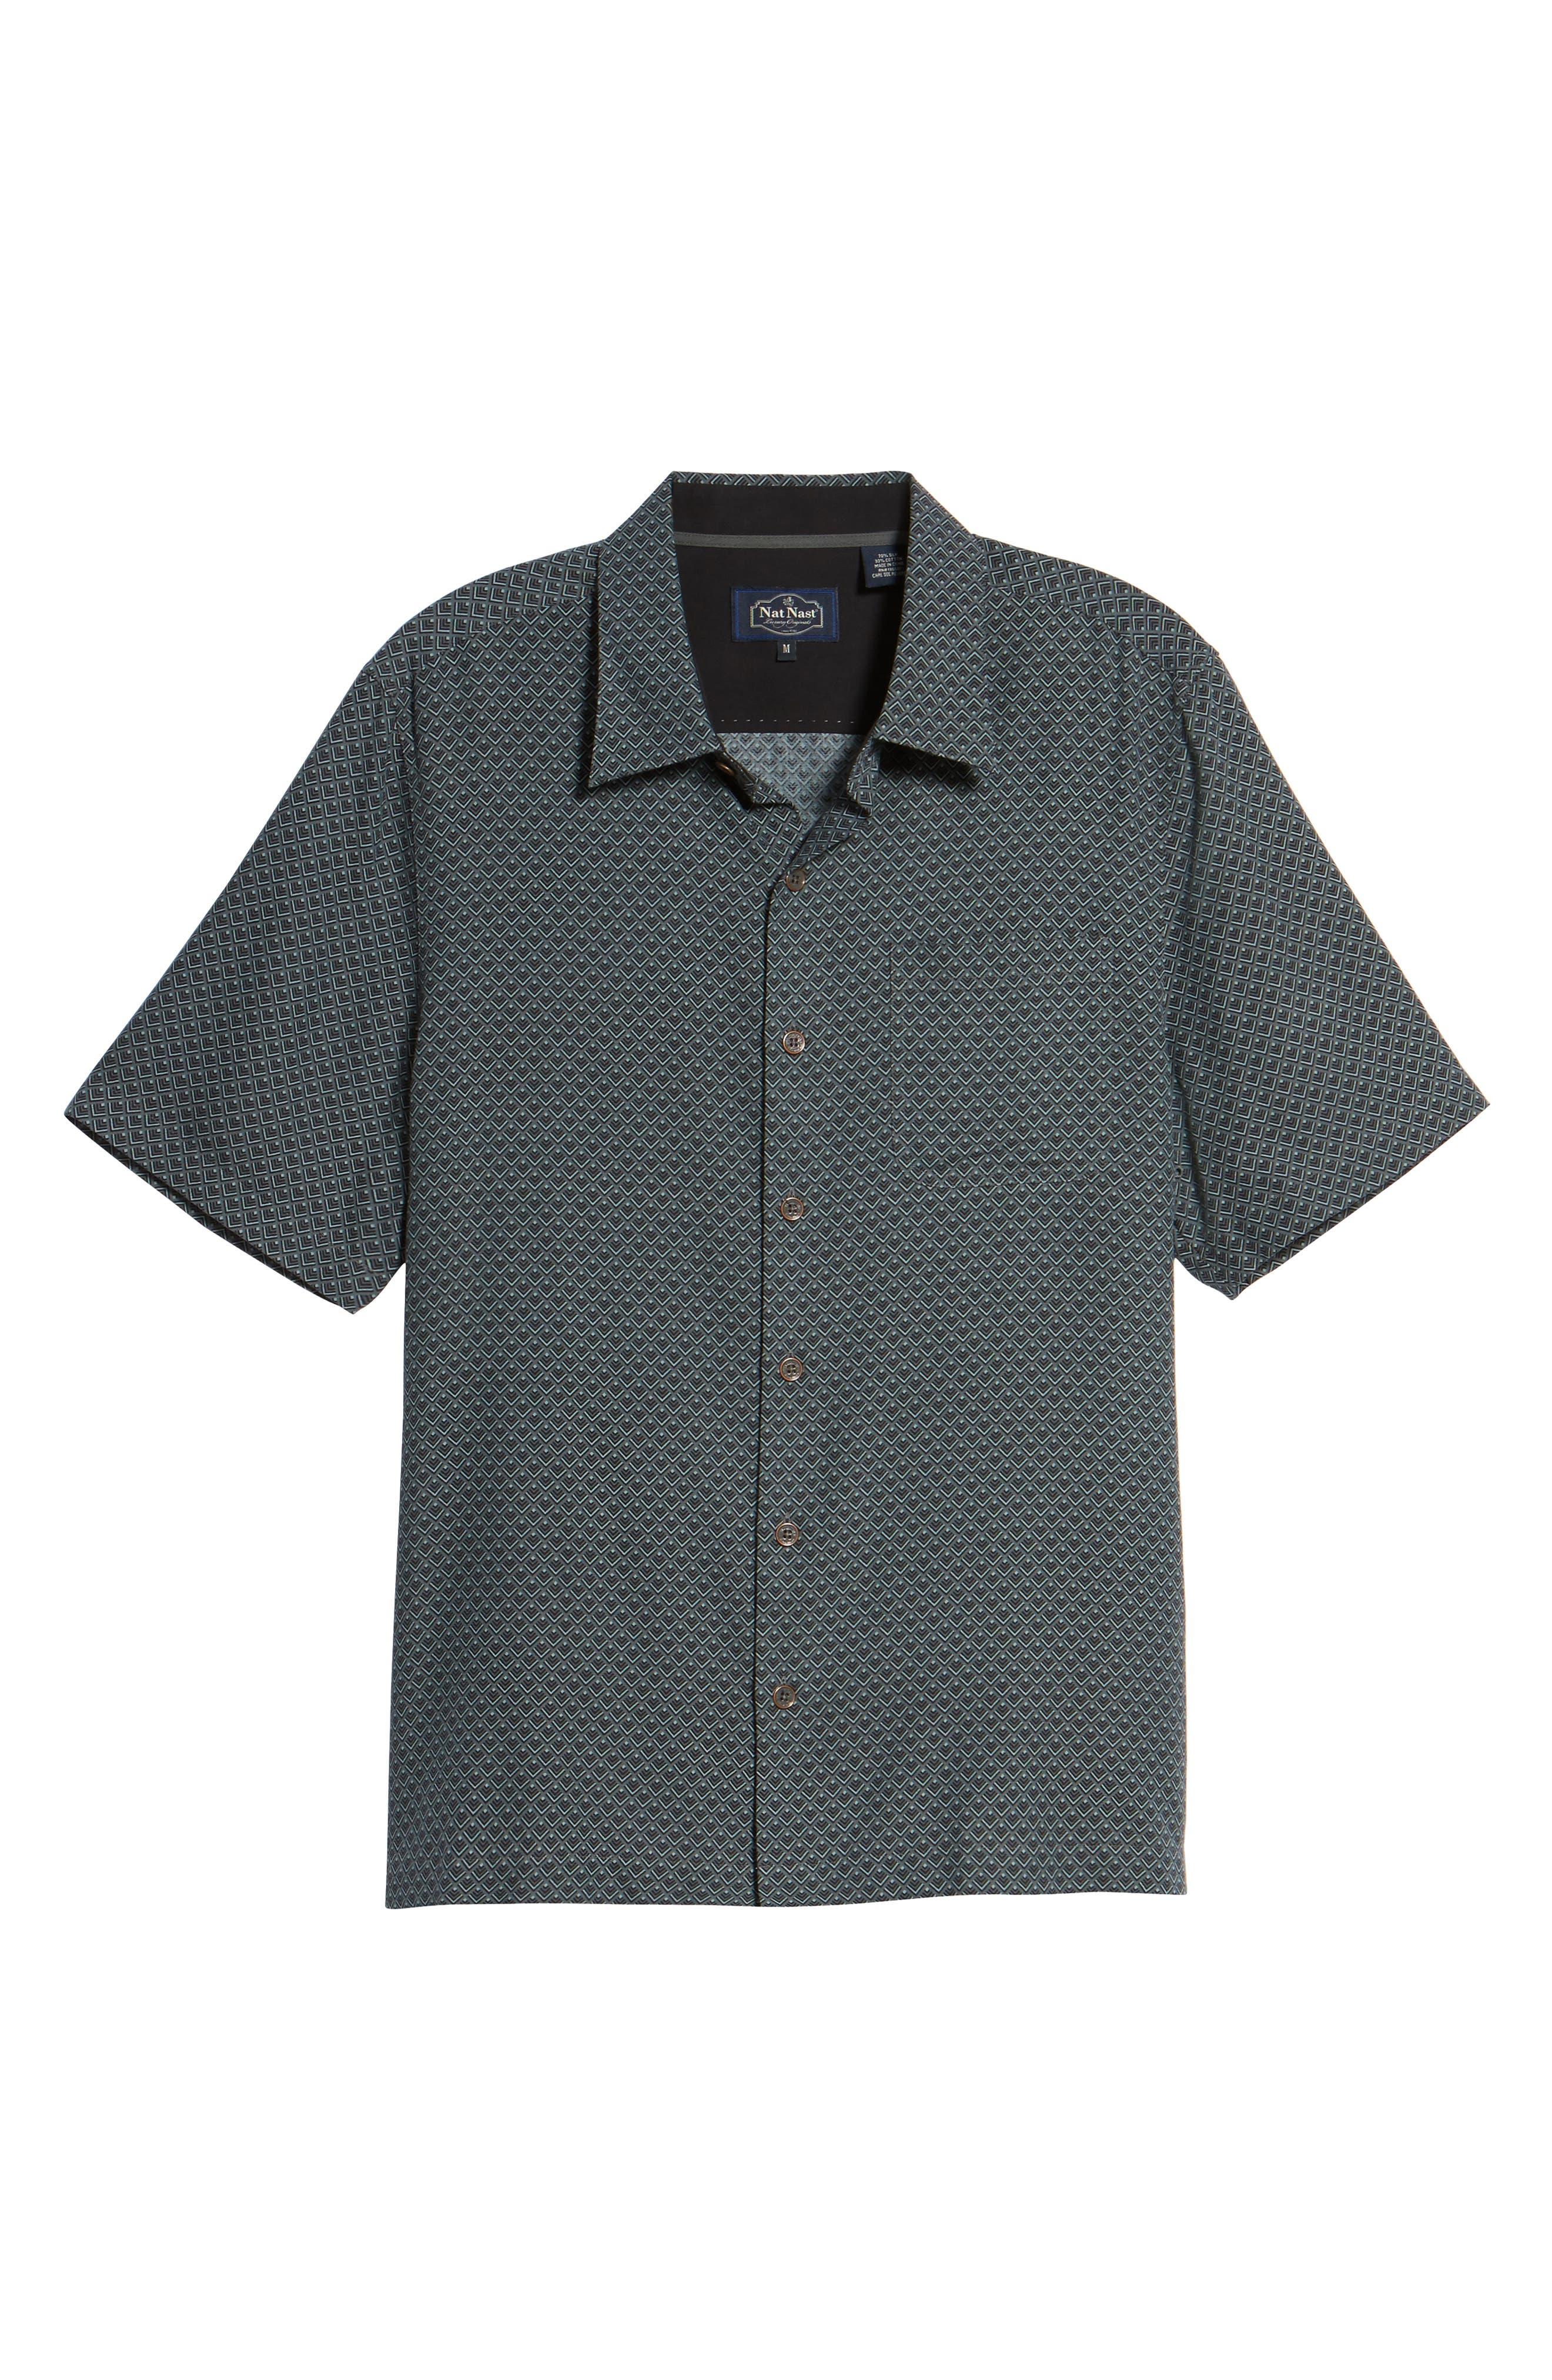 Ajax Classic Fit Silk Blend Camp Shirt,                             Alternate thumbnail 6, color,                             001